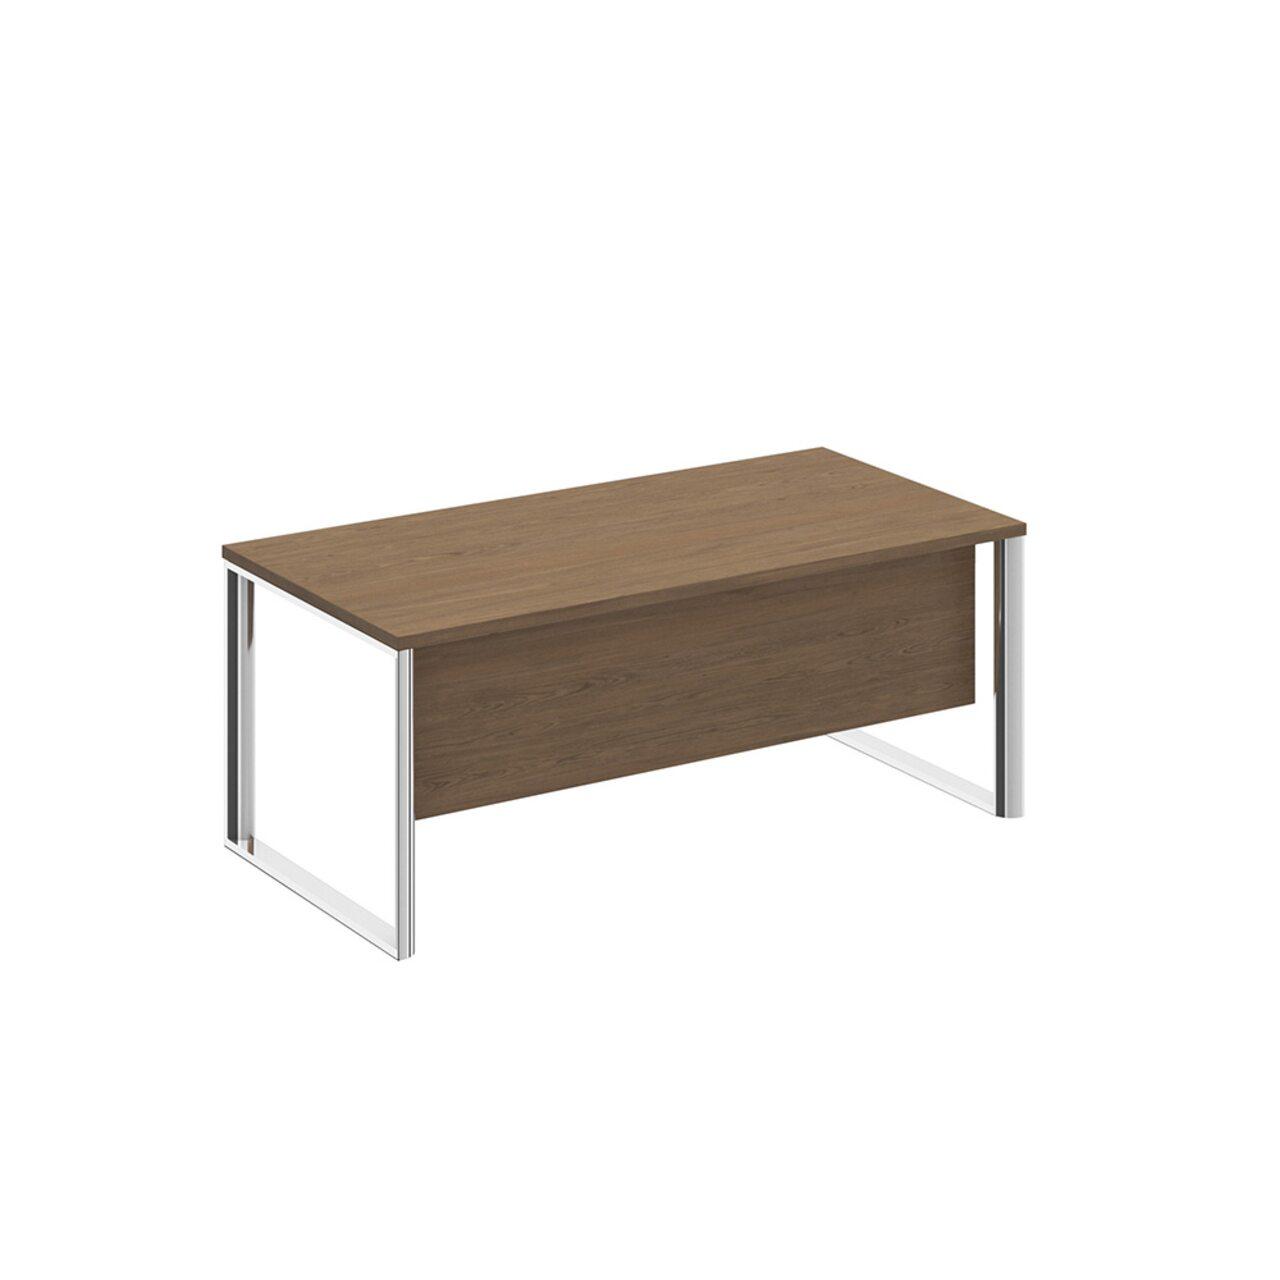 Стол руководителя  ORION 180x90x75 - фото 1